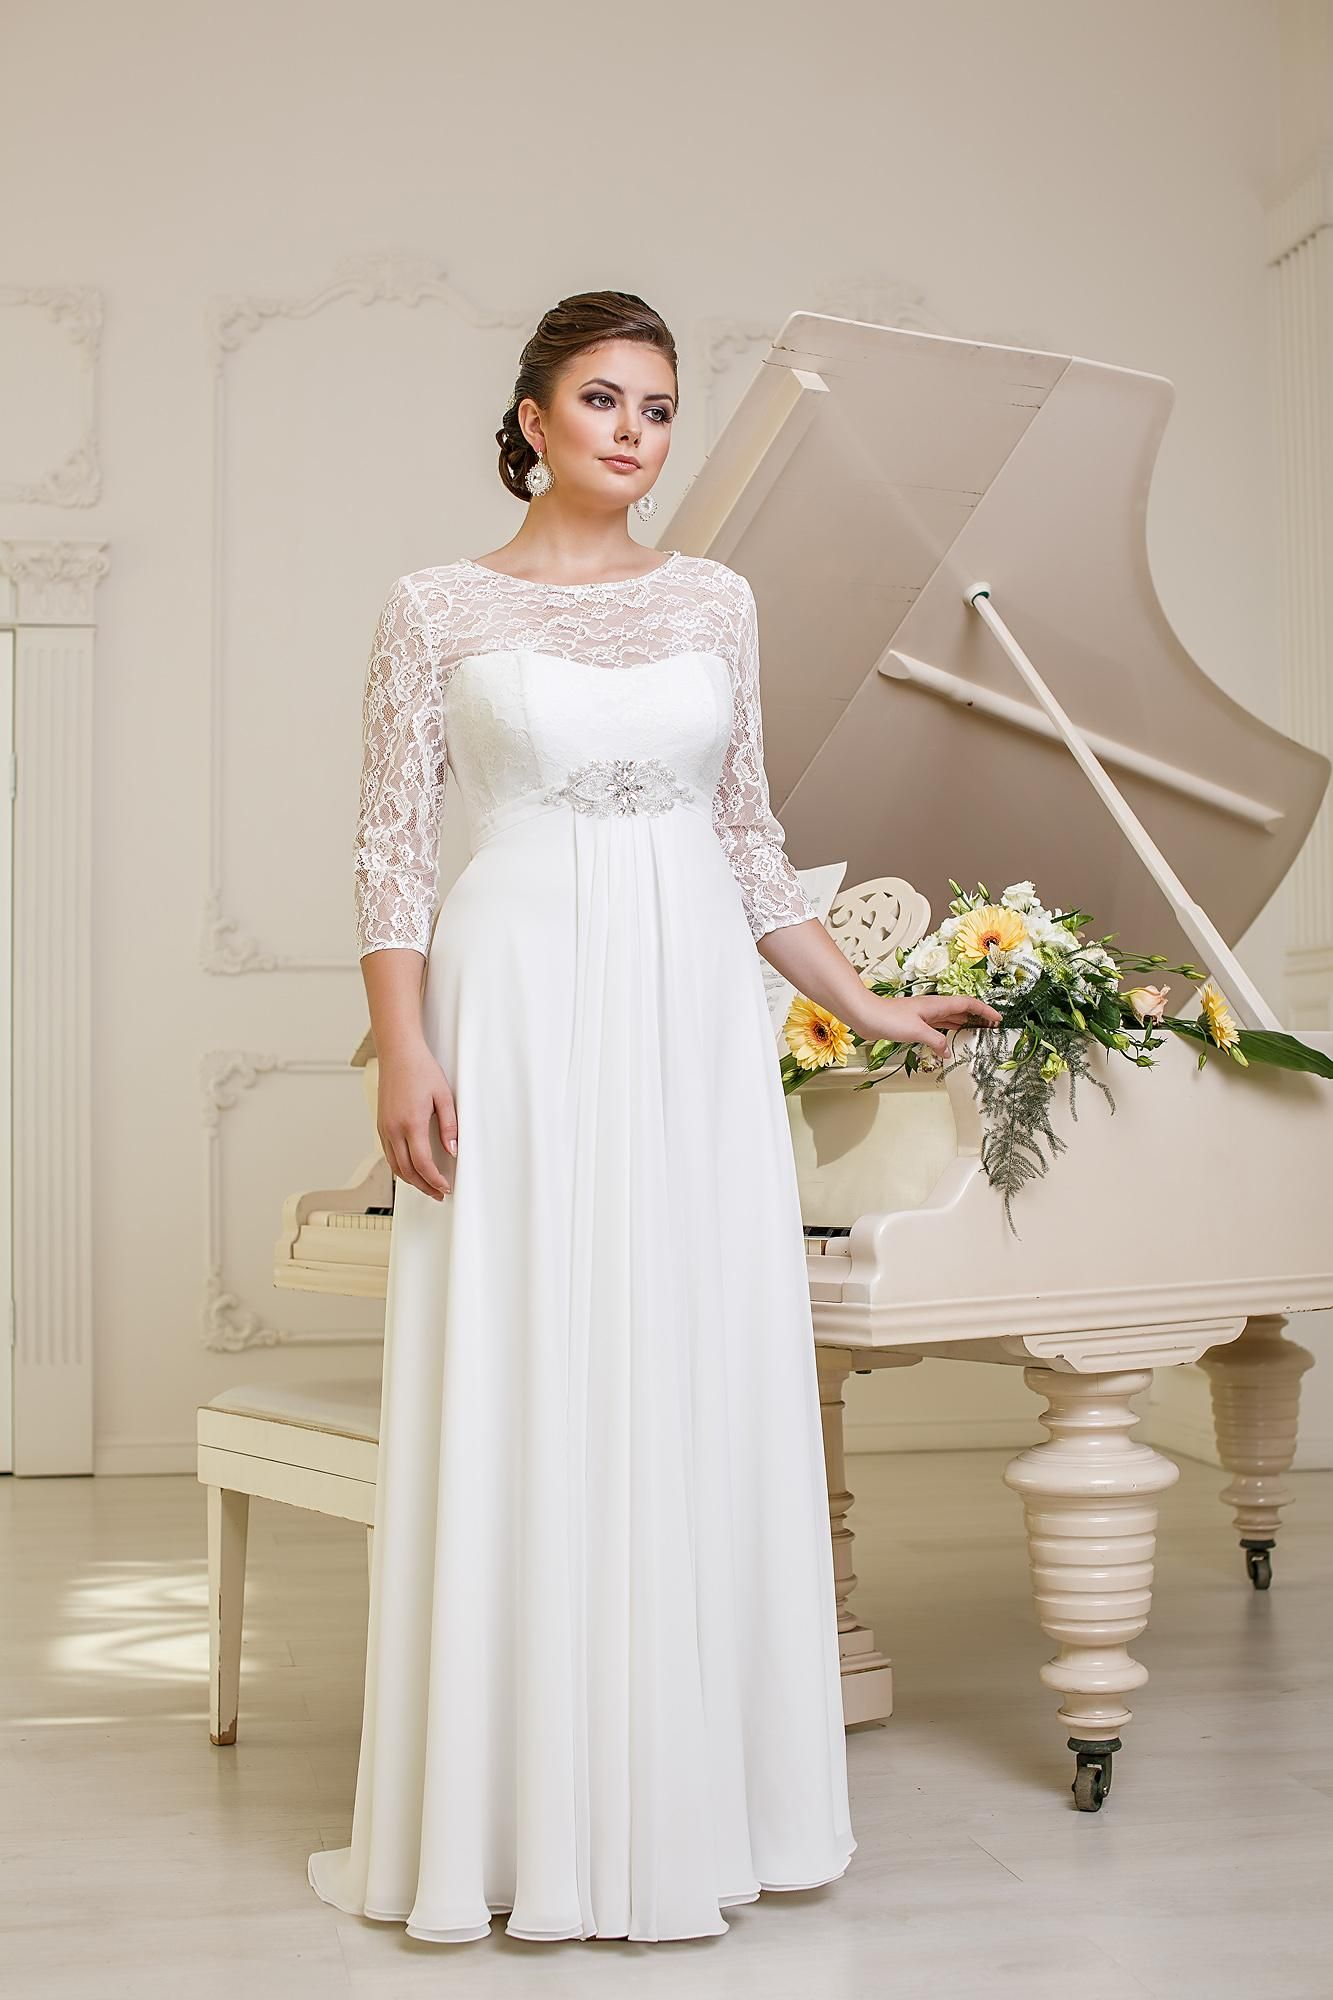 2015 Pw0006 Simple Graceful Flowing Scoop Beaded Sash 3 4 Sleeves Chiffon Floor Length A Empire Wedding Dress Empire Waist Wedding Dress Wedding Dress Sleeves [ 2000 x 1333 Pixel ]